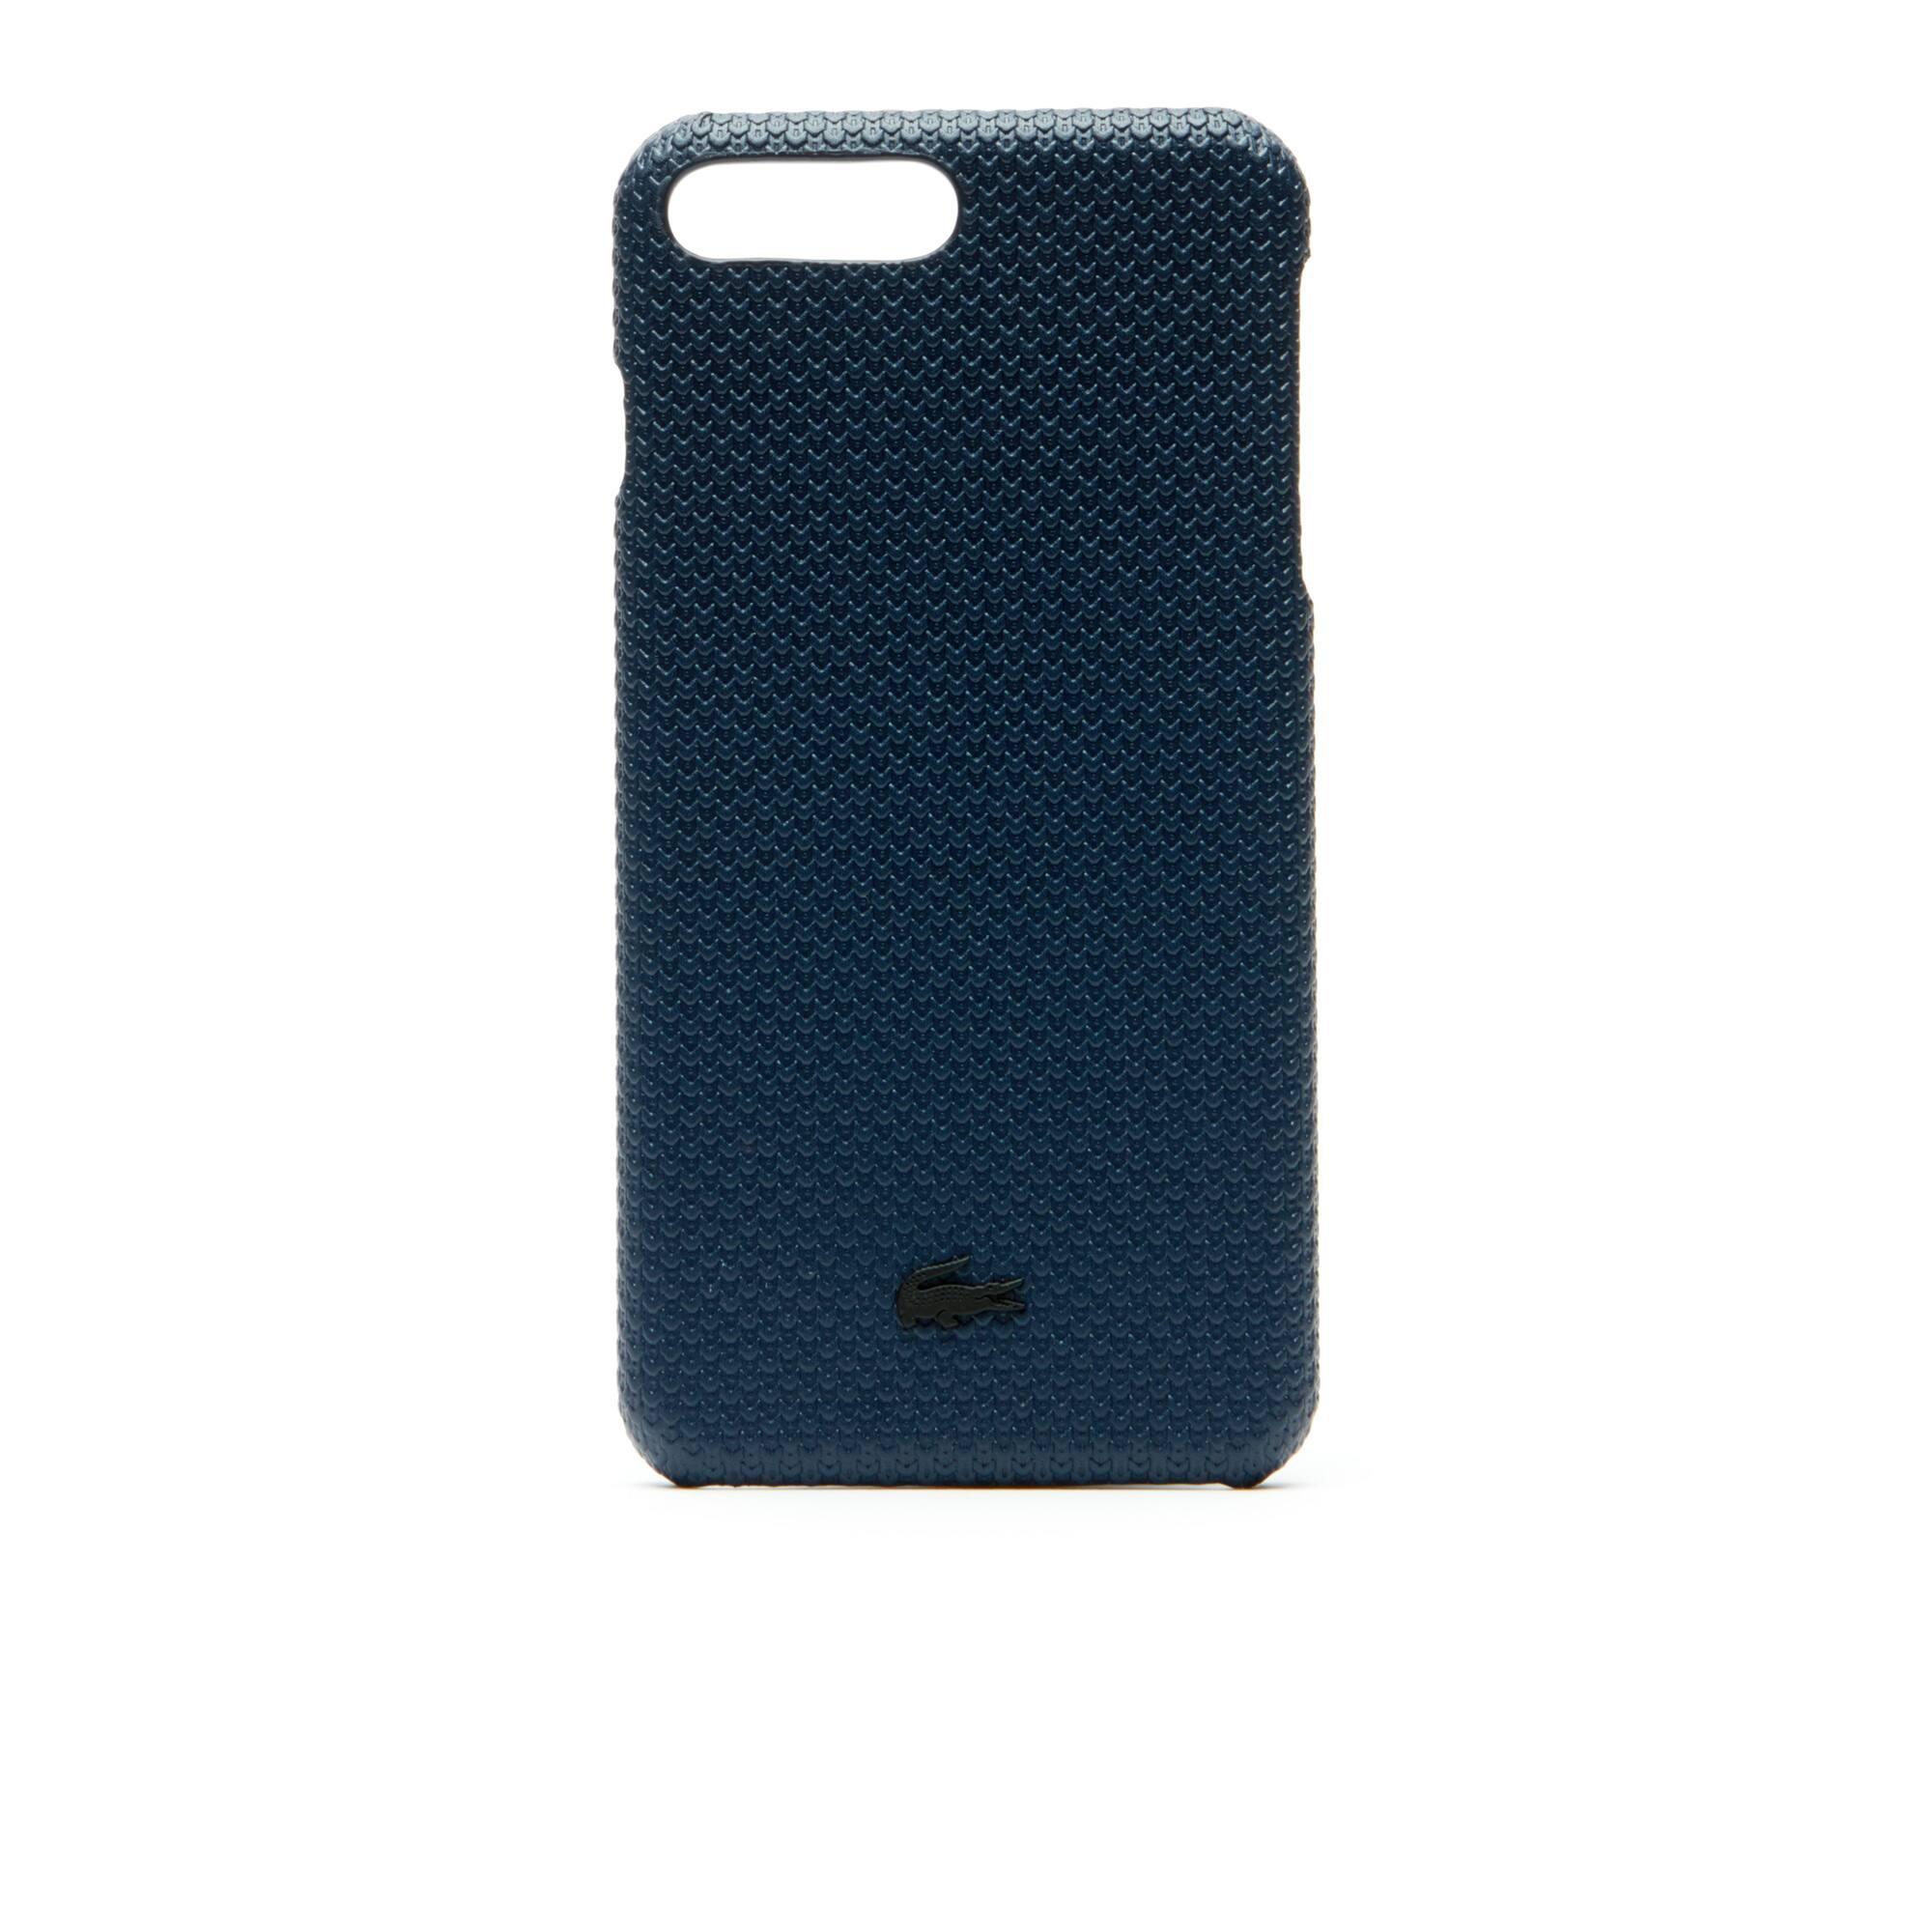 coque iphone lacoste 8